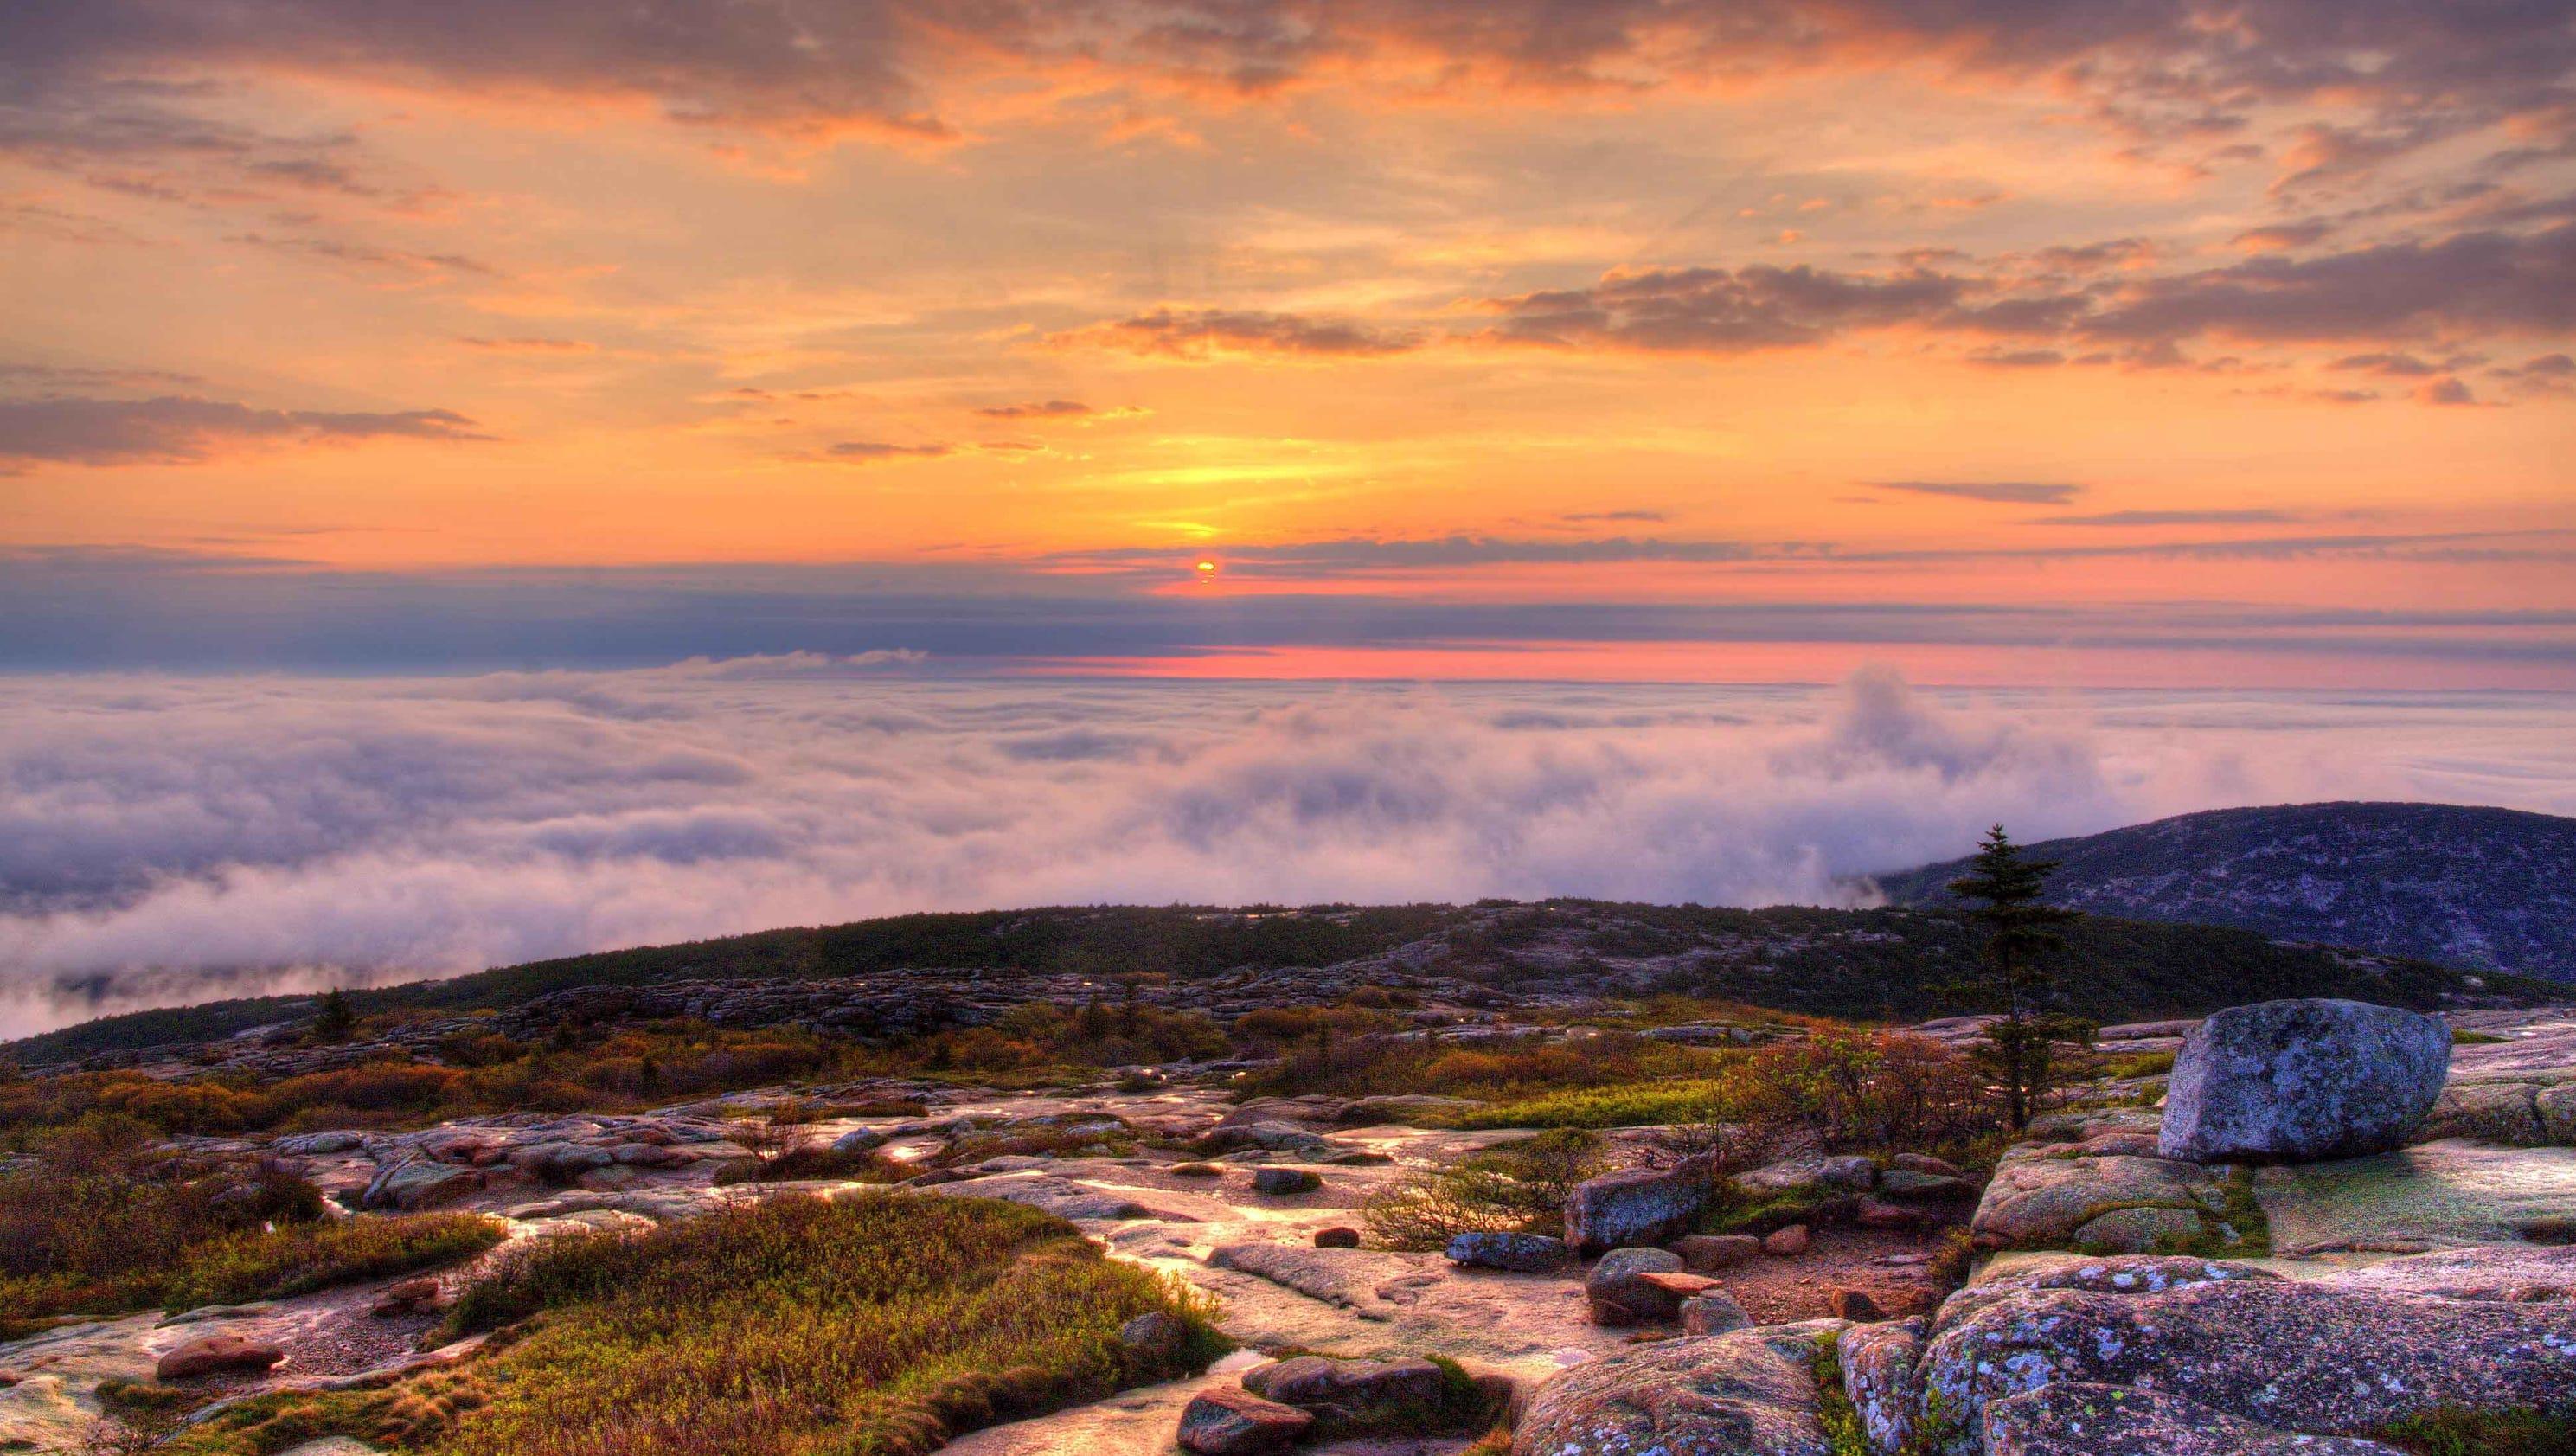 acadia national park  there u0026 39 s nothing like the sunrise here